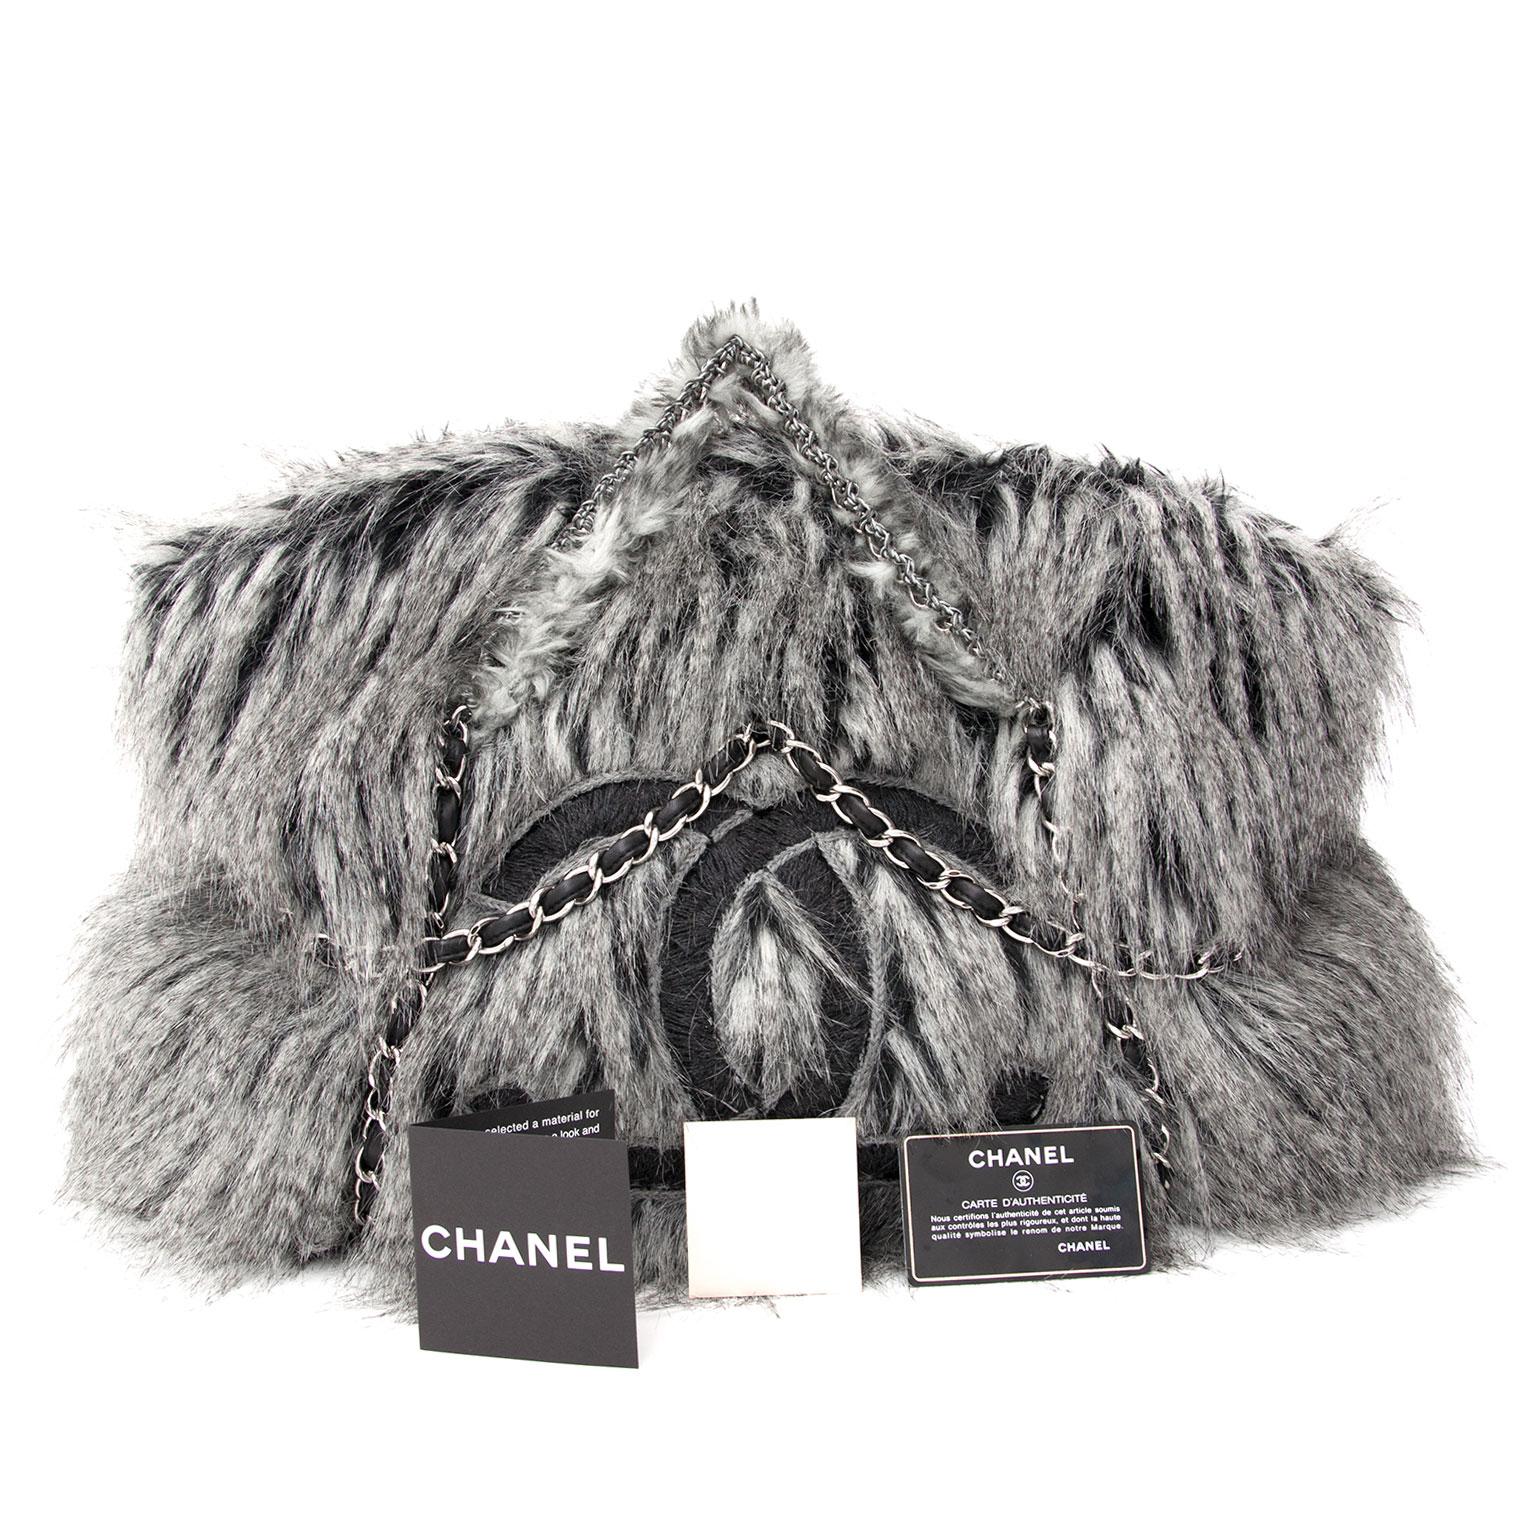 13c931c3a6a1 ... acheter en ligne secodne main sac a main limite Chanel Arctic Fantasy  Fur Tote Bag